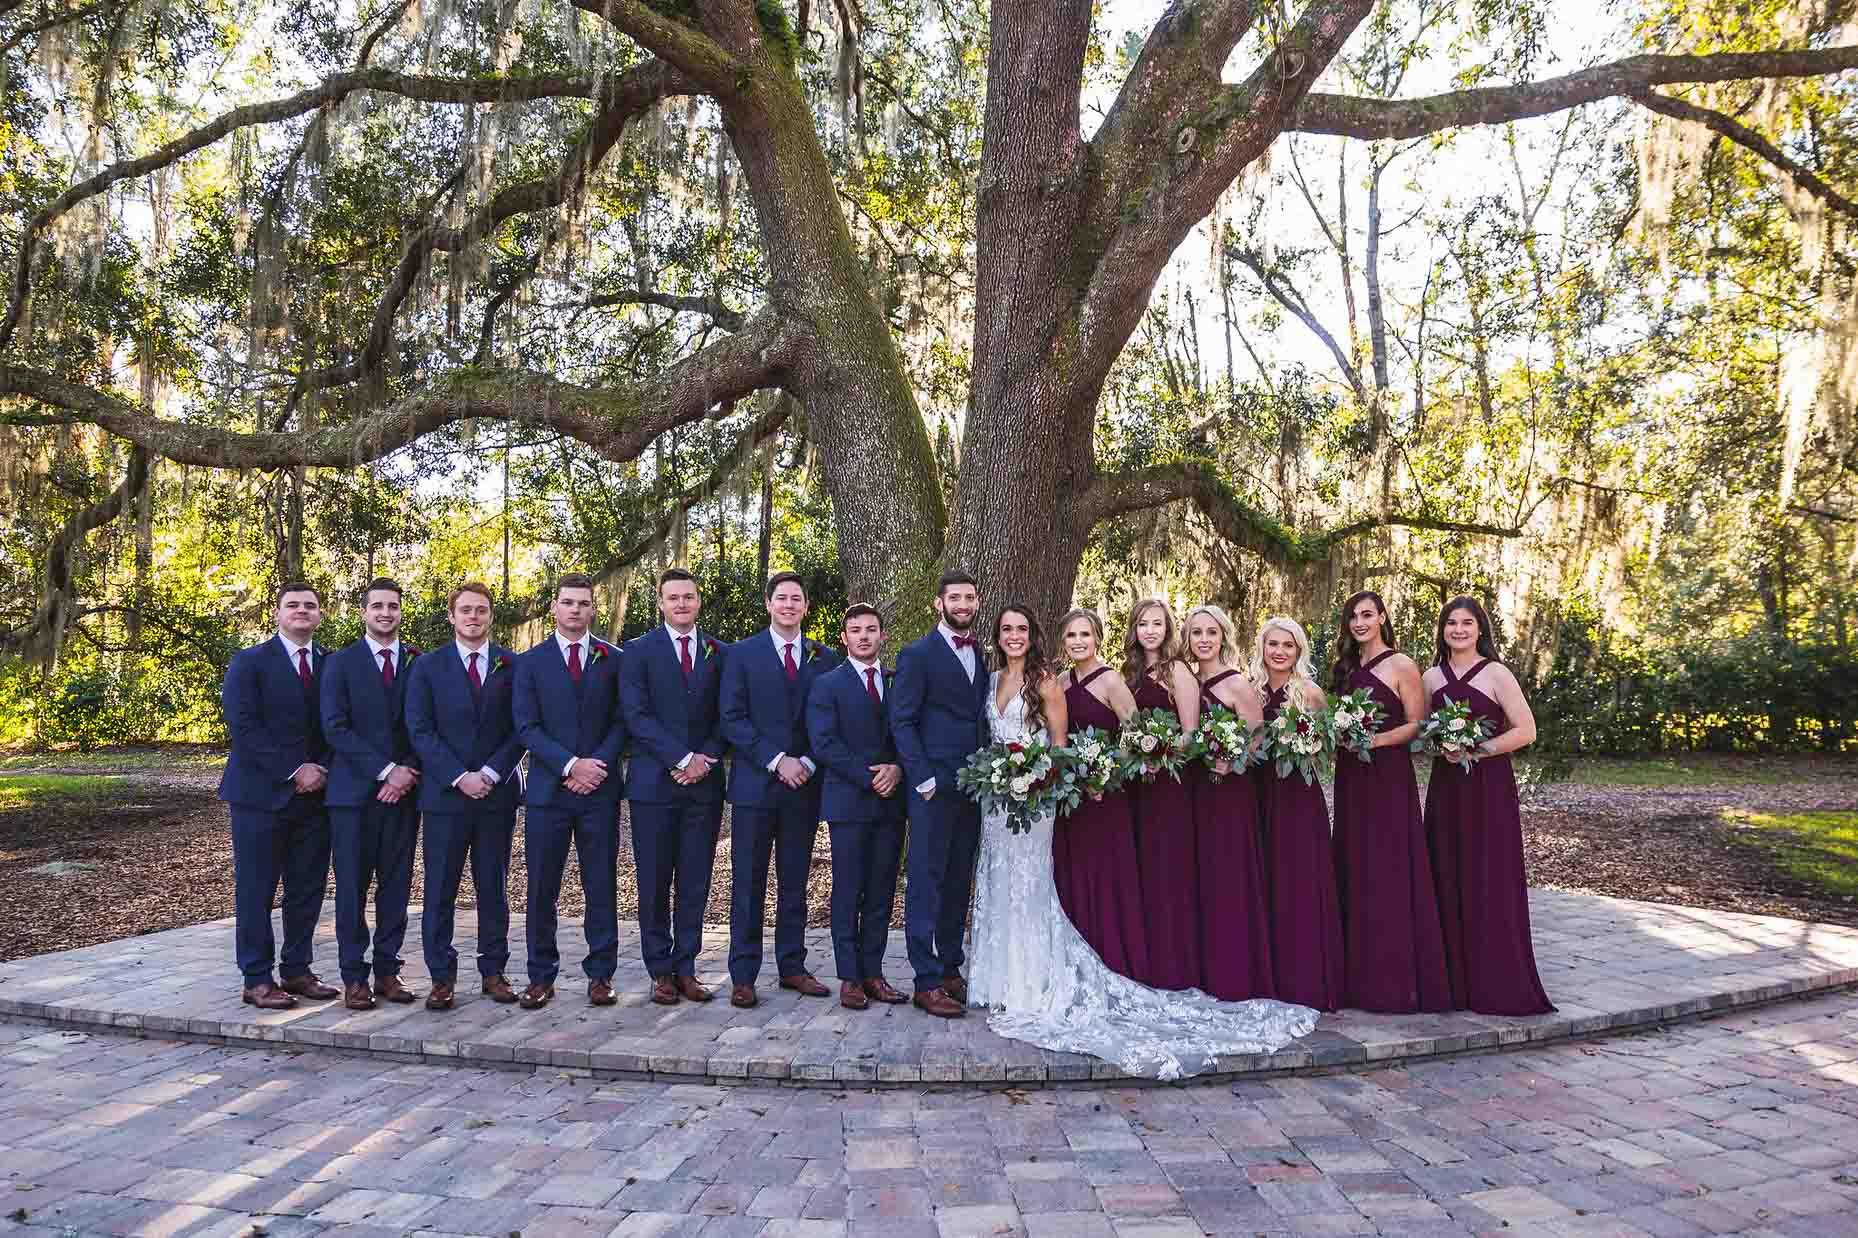 adam-szarmack-bowing-oaks-wedding-photographer-jacksonville-86.jpg